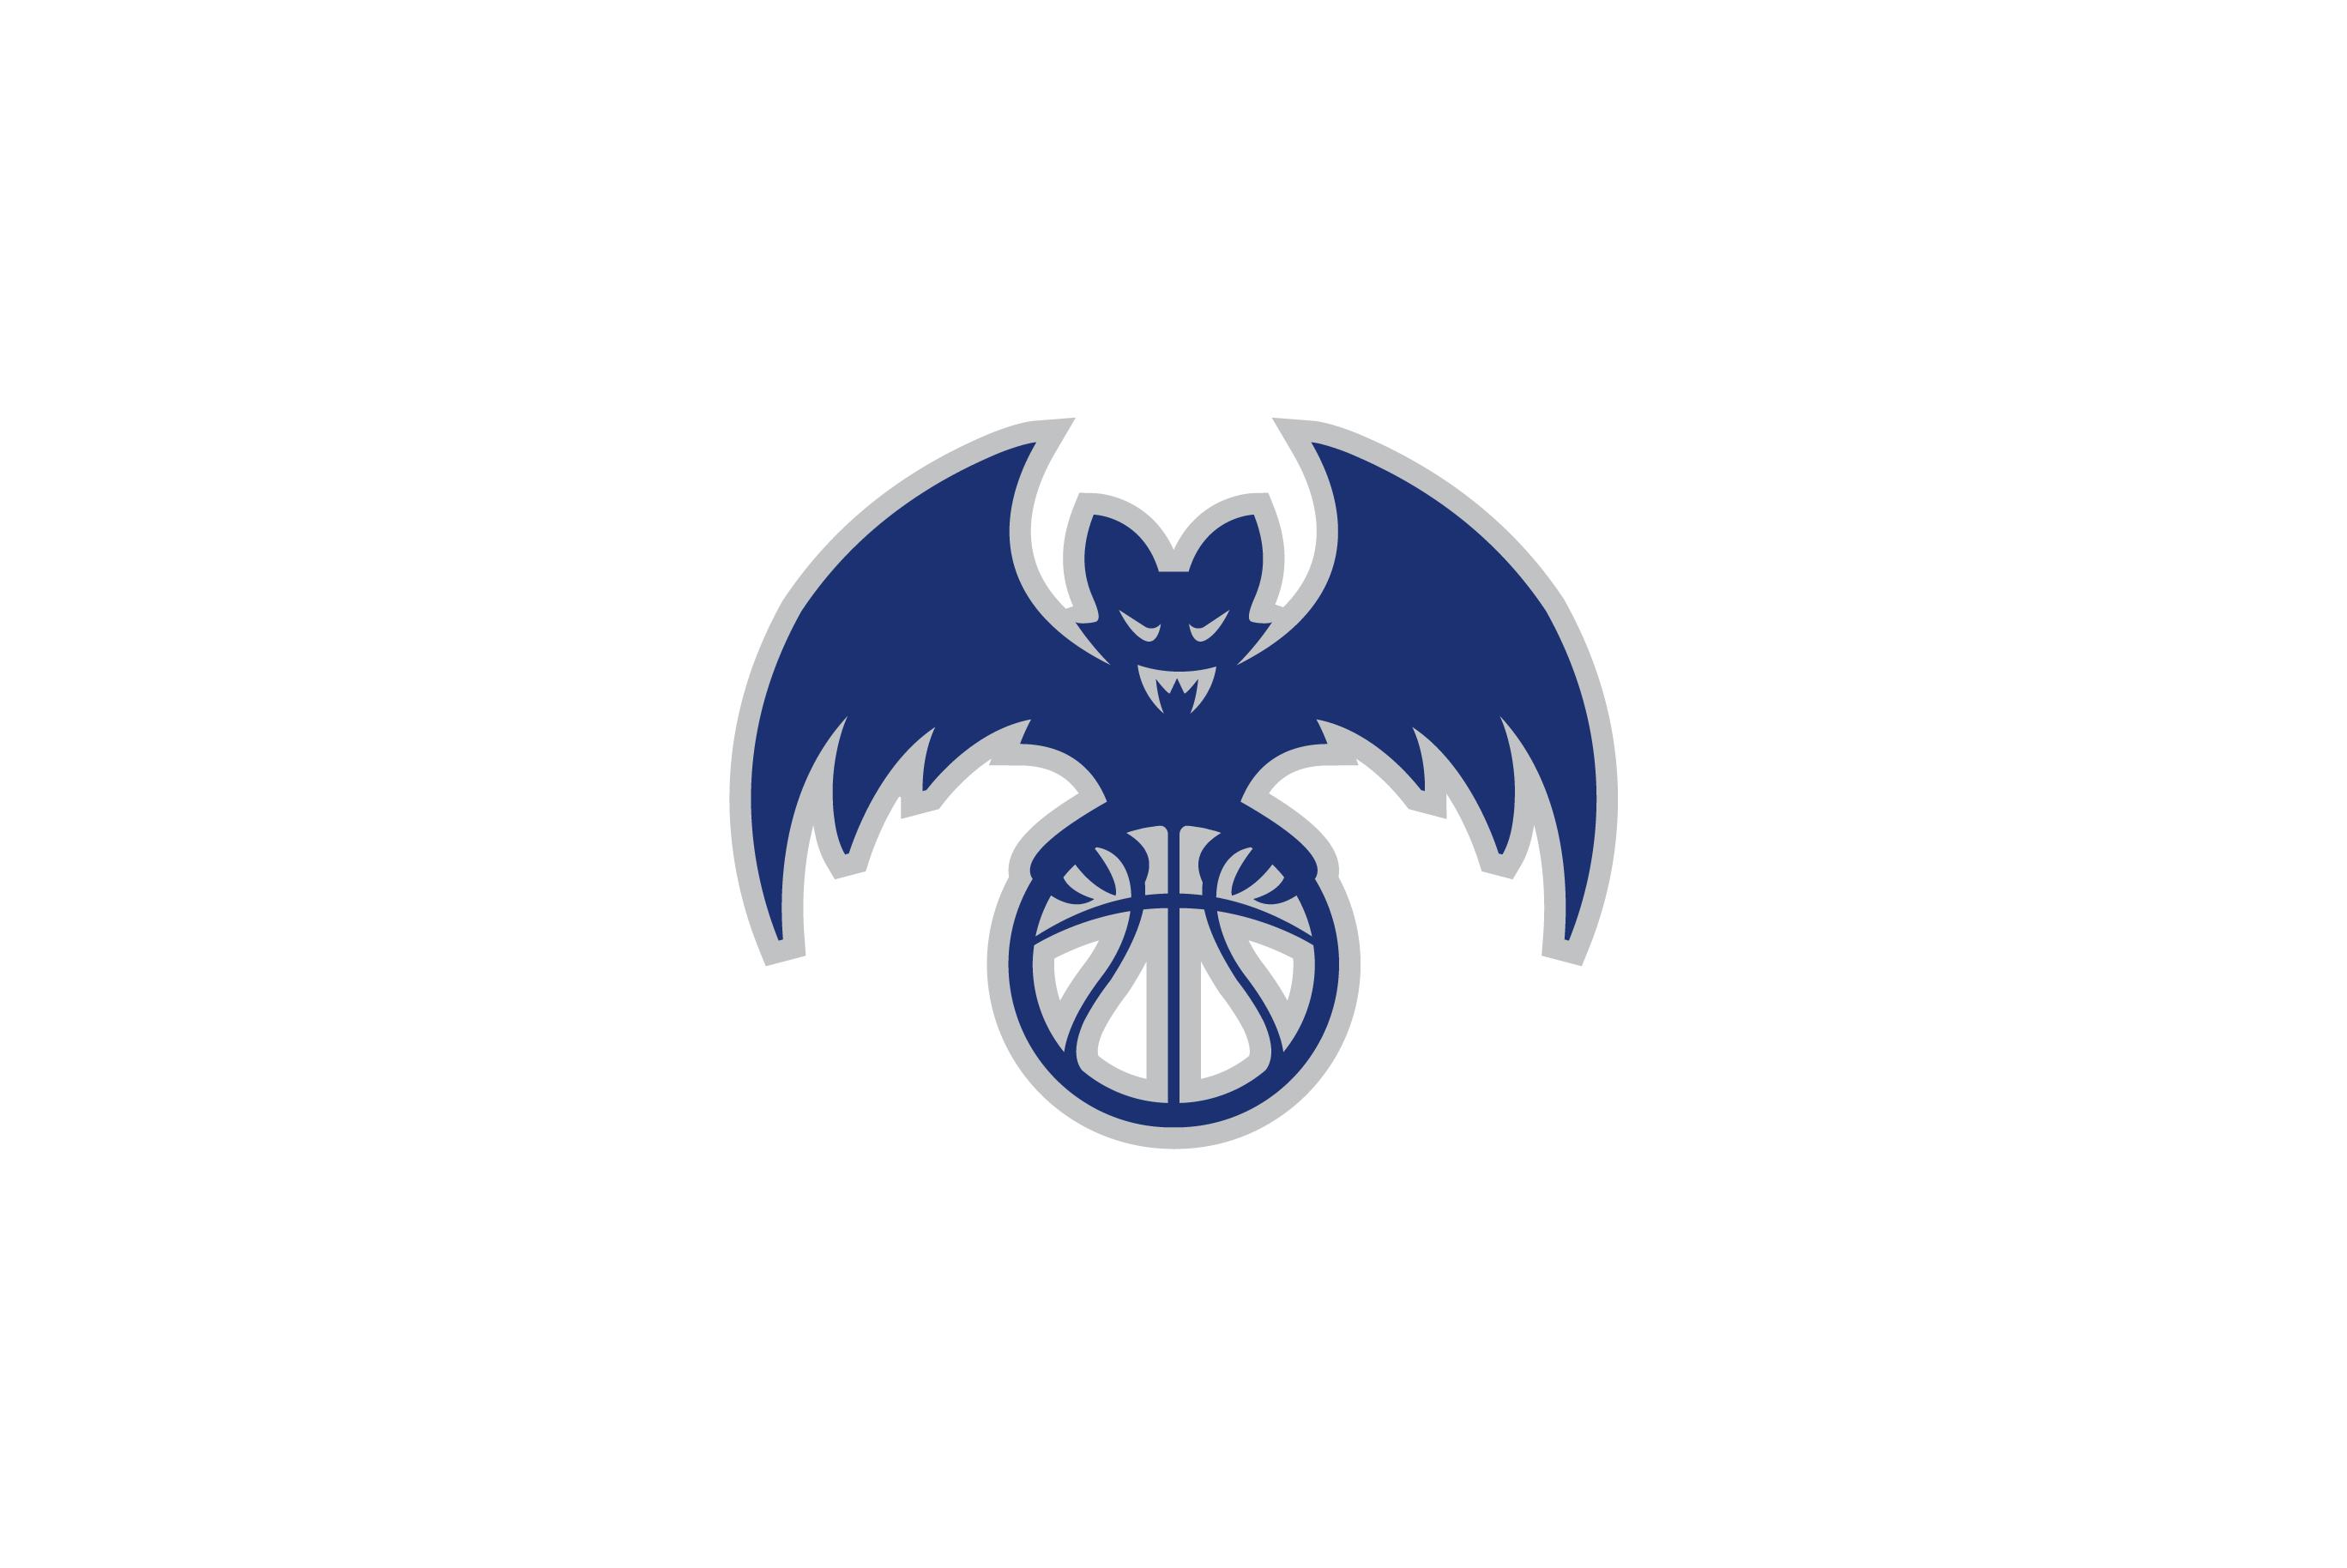 bat ball logo design logo cowboy